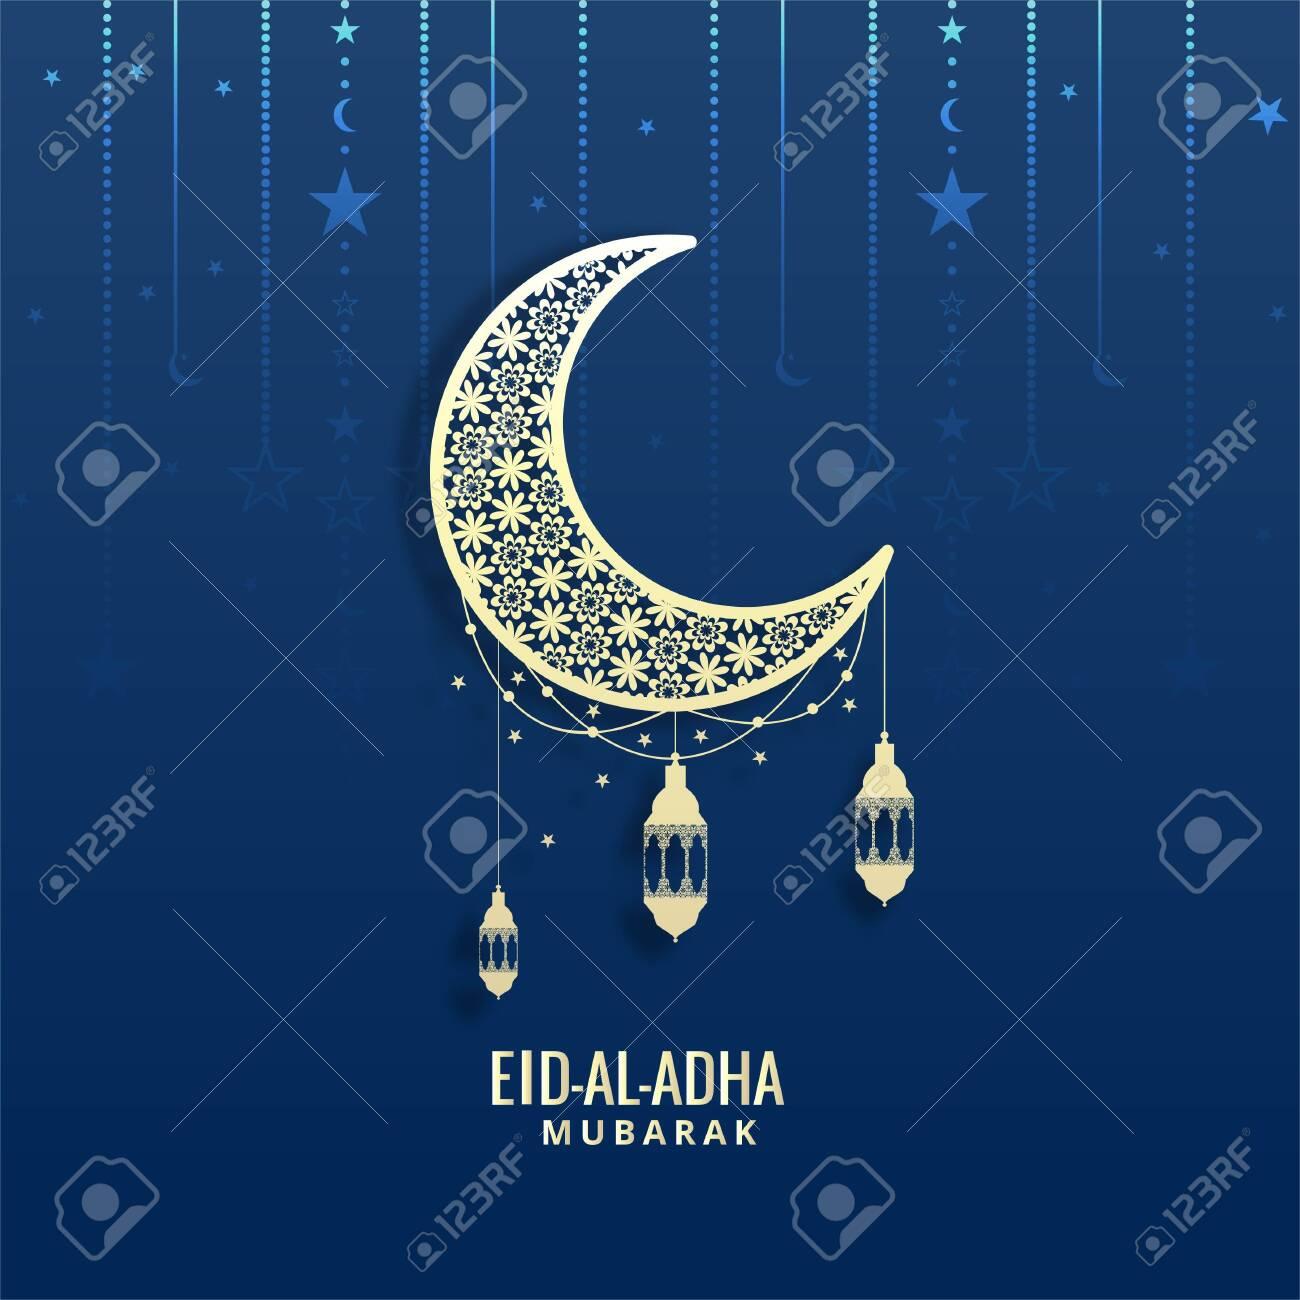 Eid-Al-Adha Mubarak Vector greeting card Background